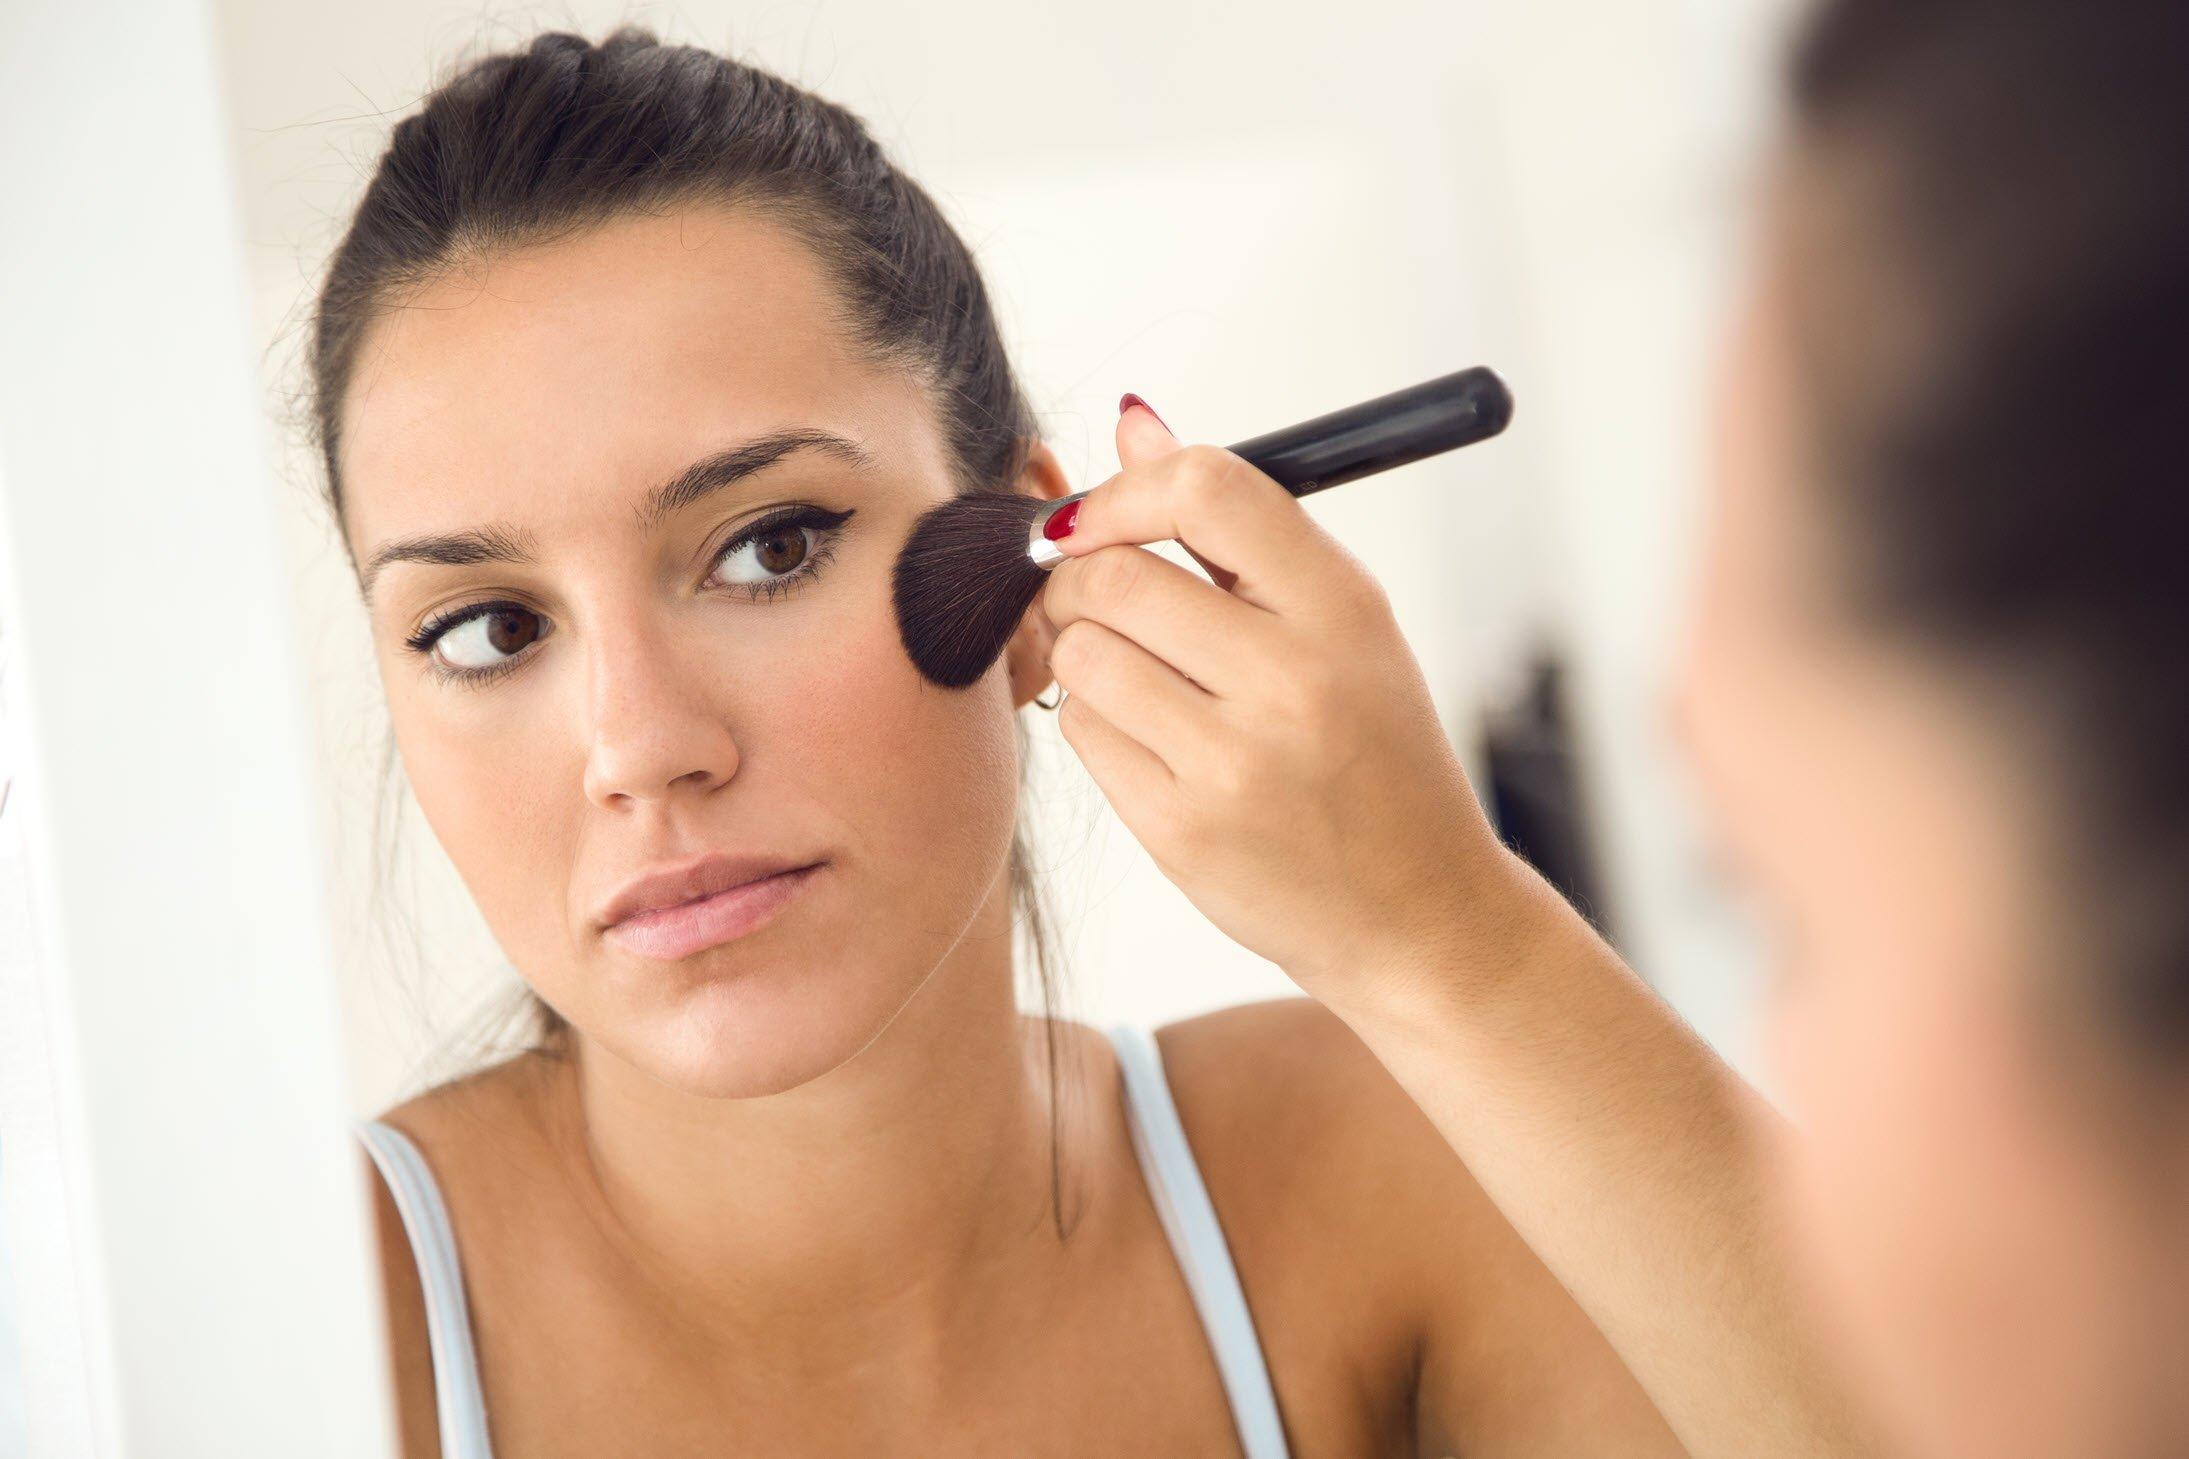 Face Powder Reduce Wrinkles